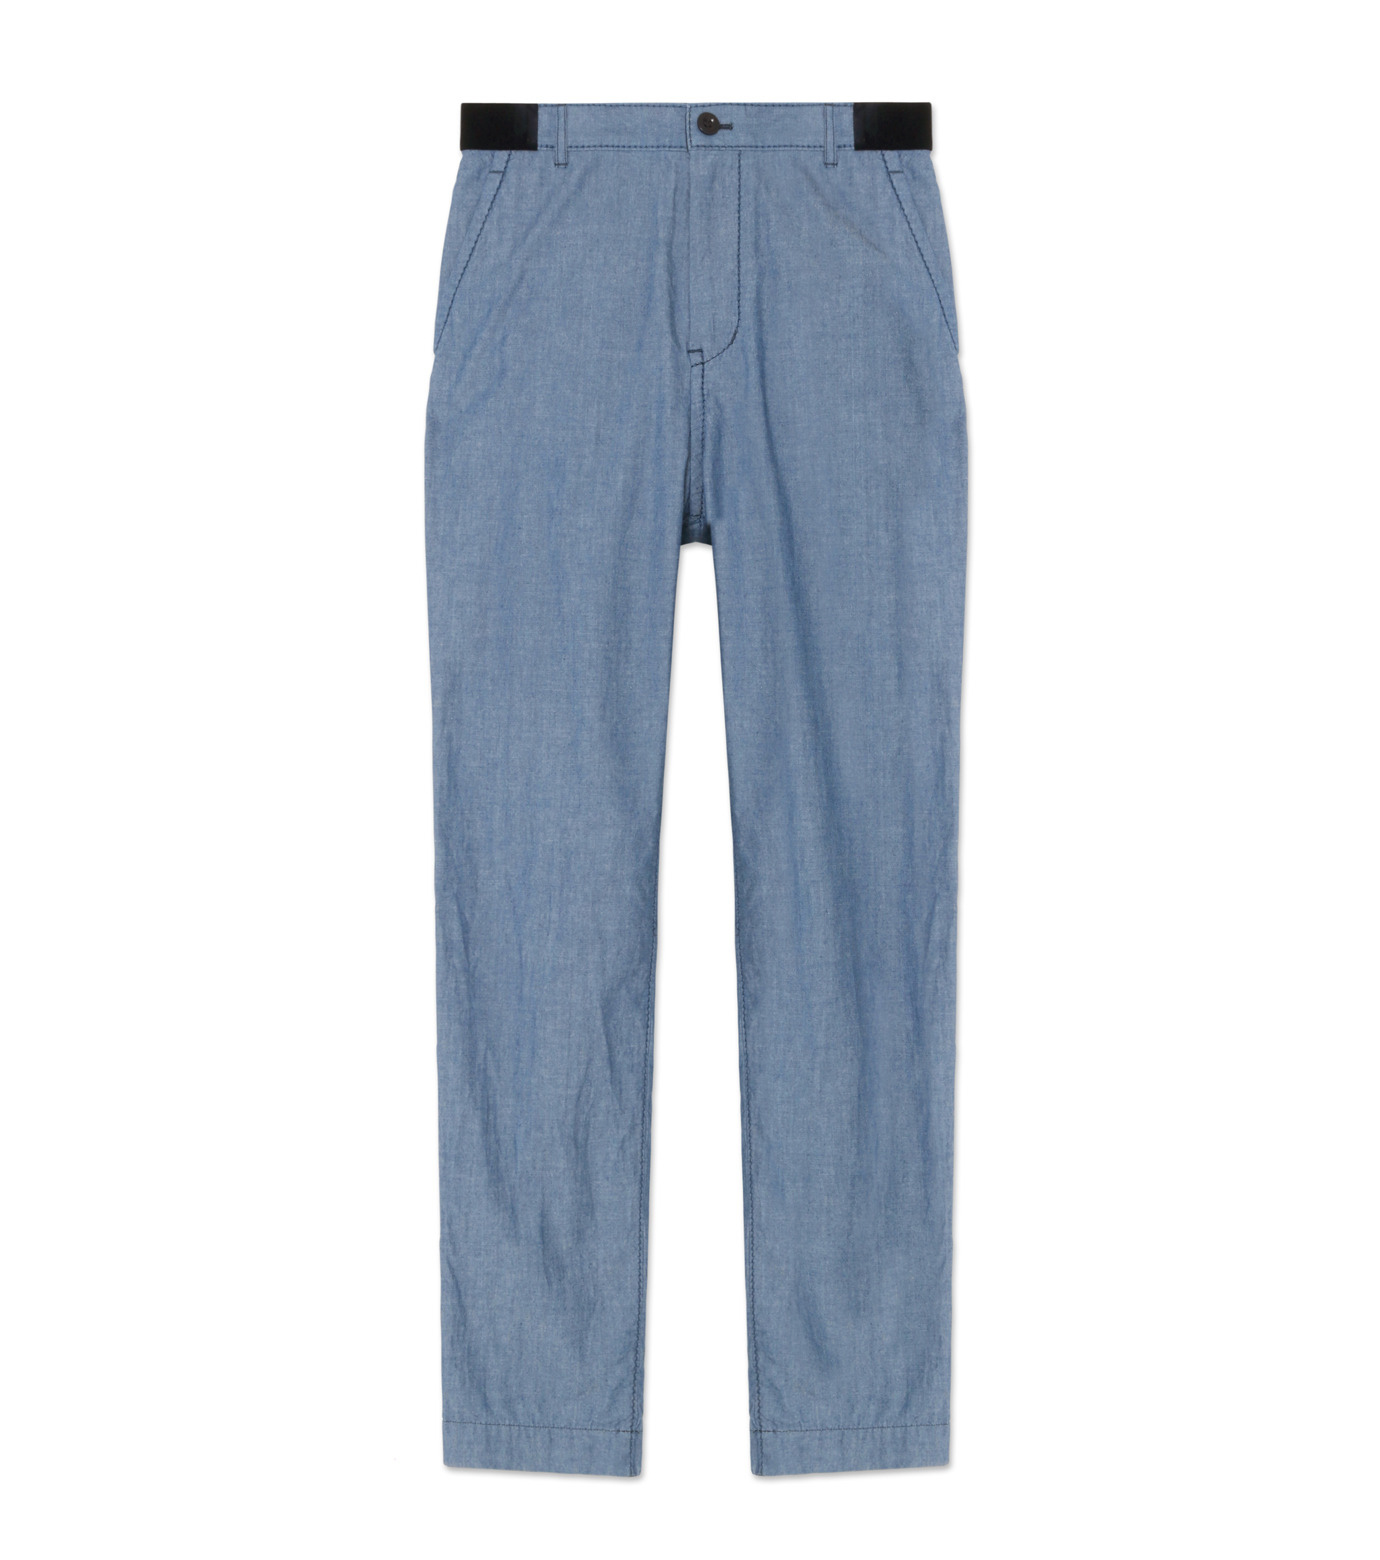 Sacai(サカイ)のDenim Pants-BLUE-16-01091M-92 拡大詳細画像1